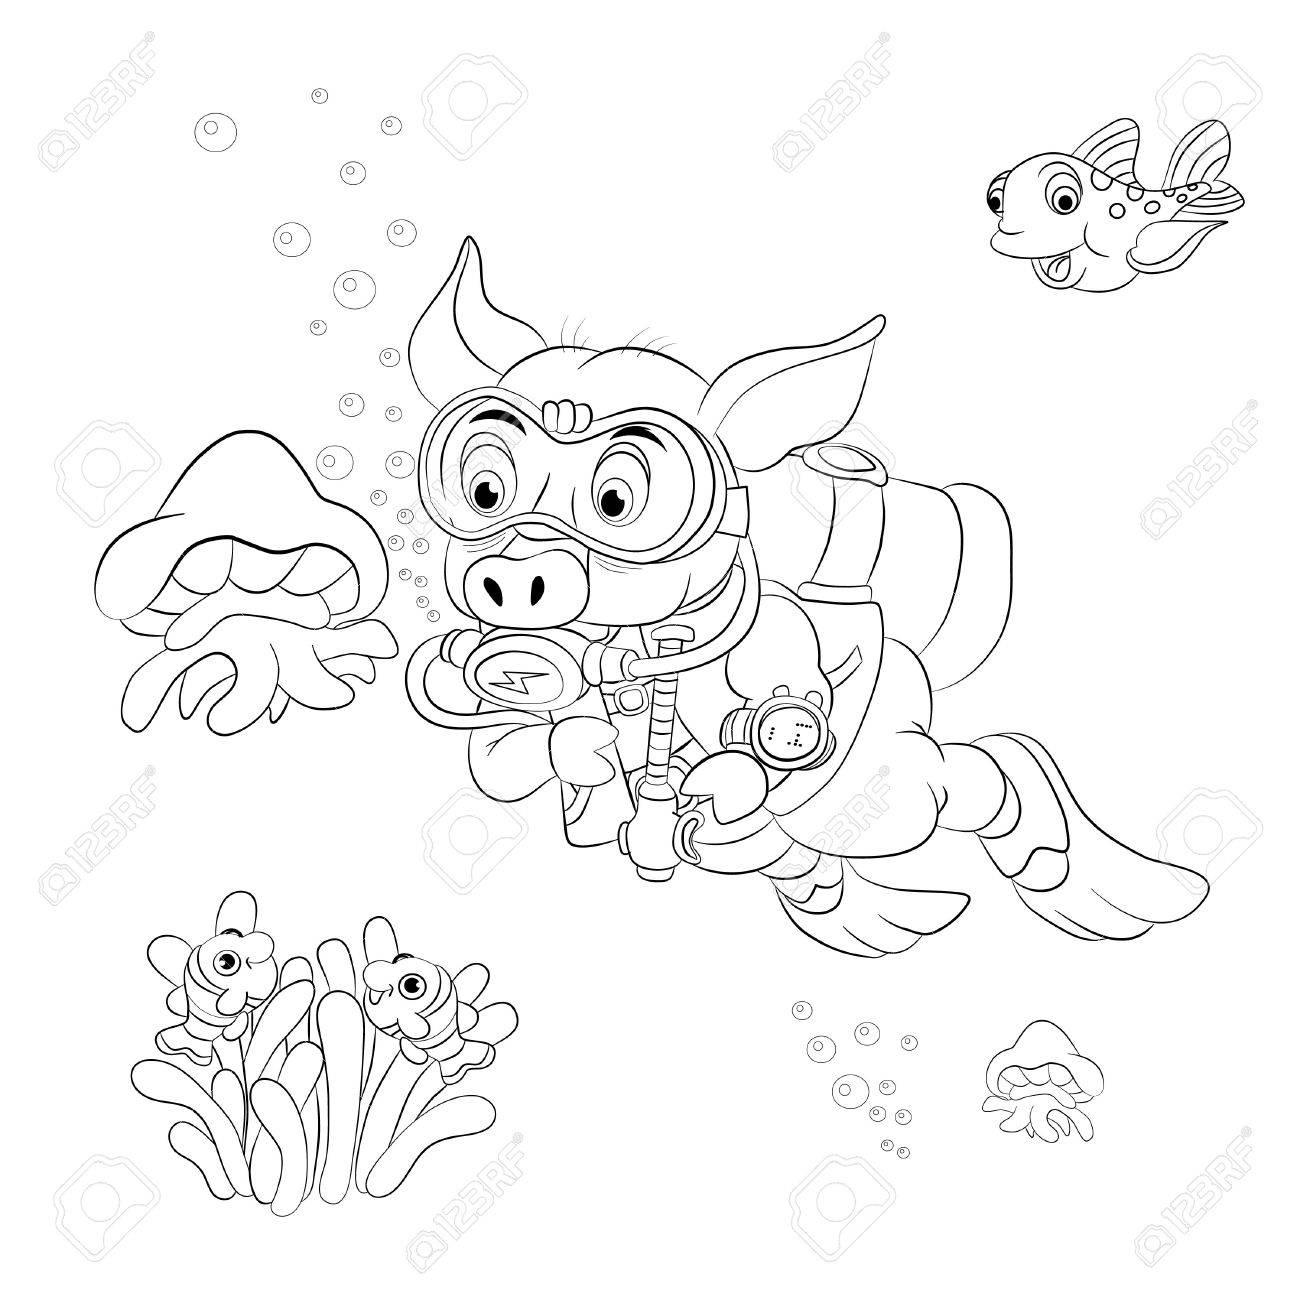 Funny Cartoon Pig Diver Looking At Jellyfish Coloring Book Stock Vector